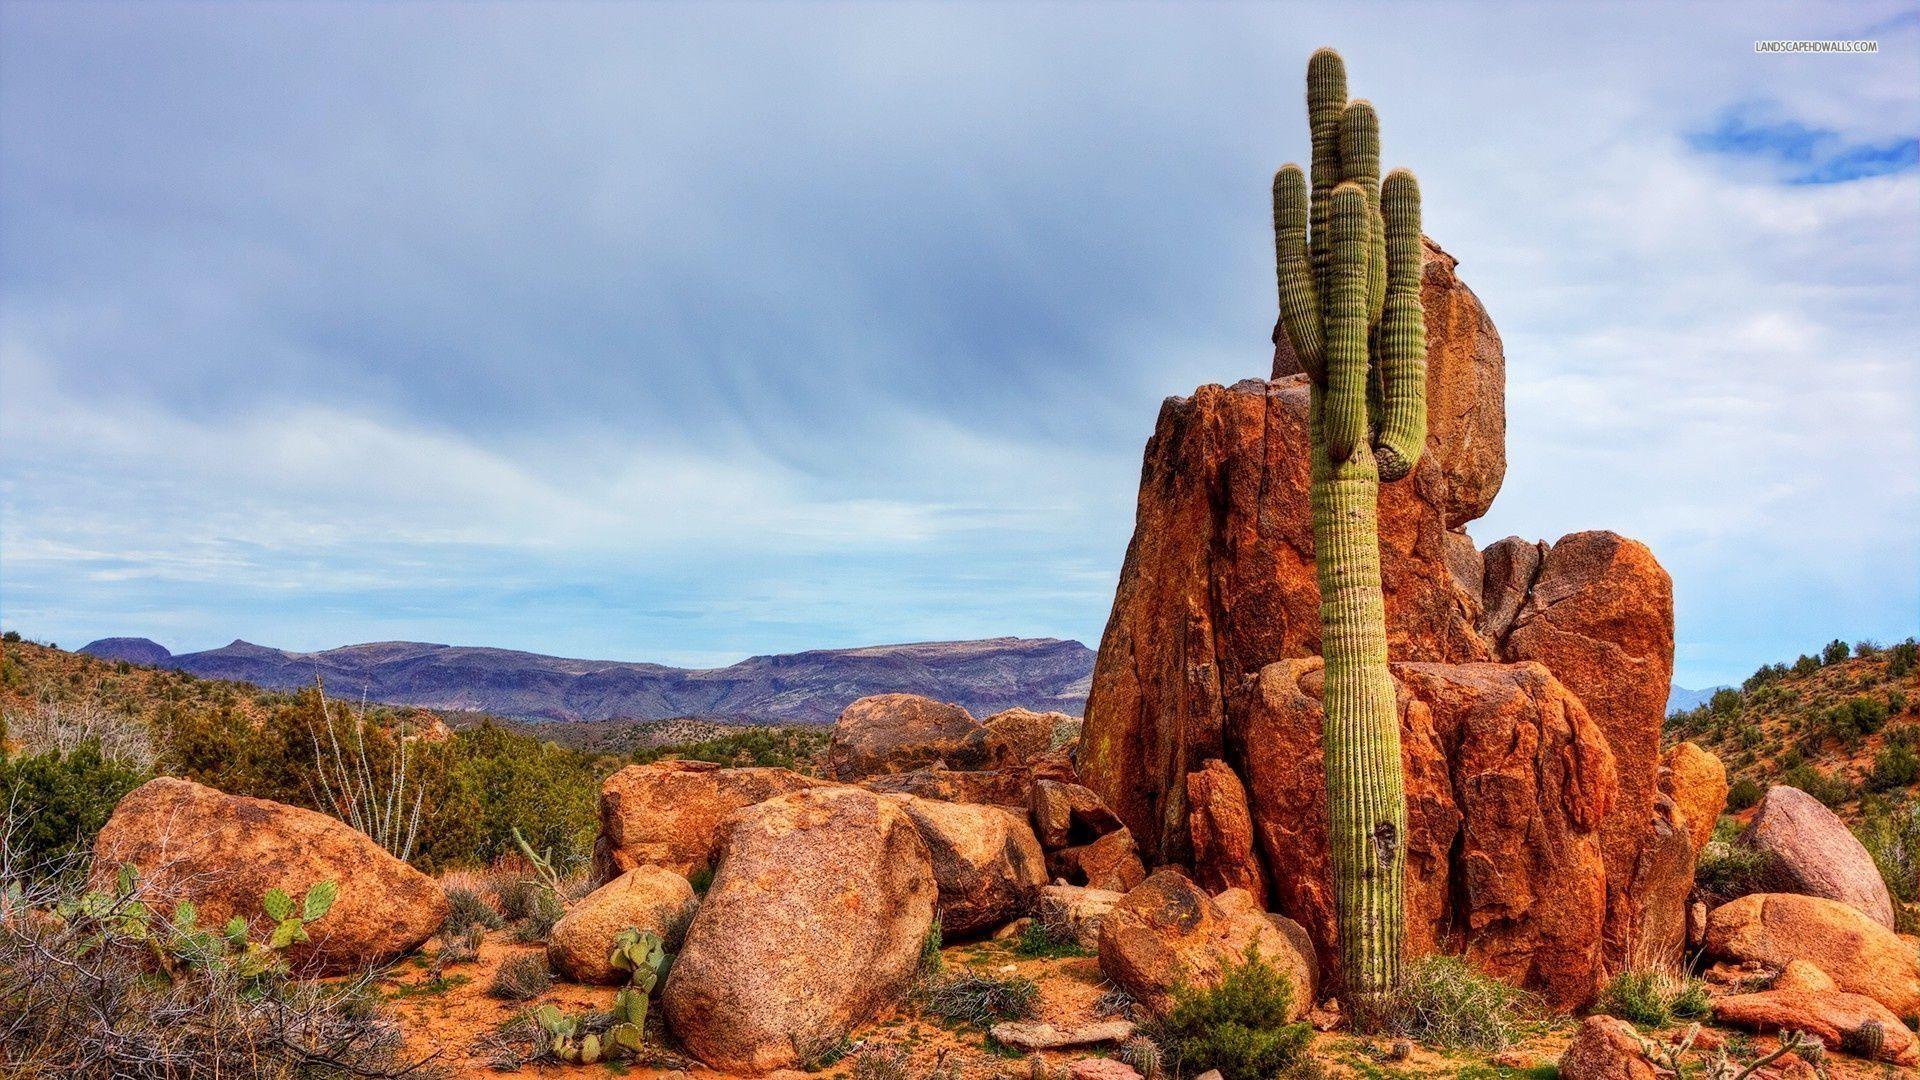 Arizona Desert Beautiful Things I Would Like To See Bucket List